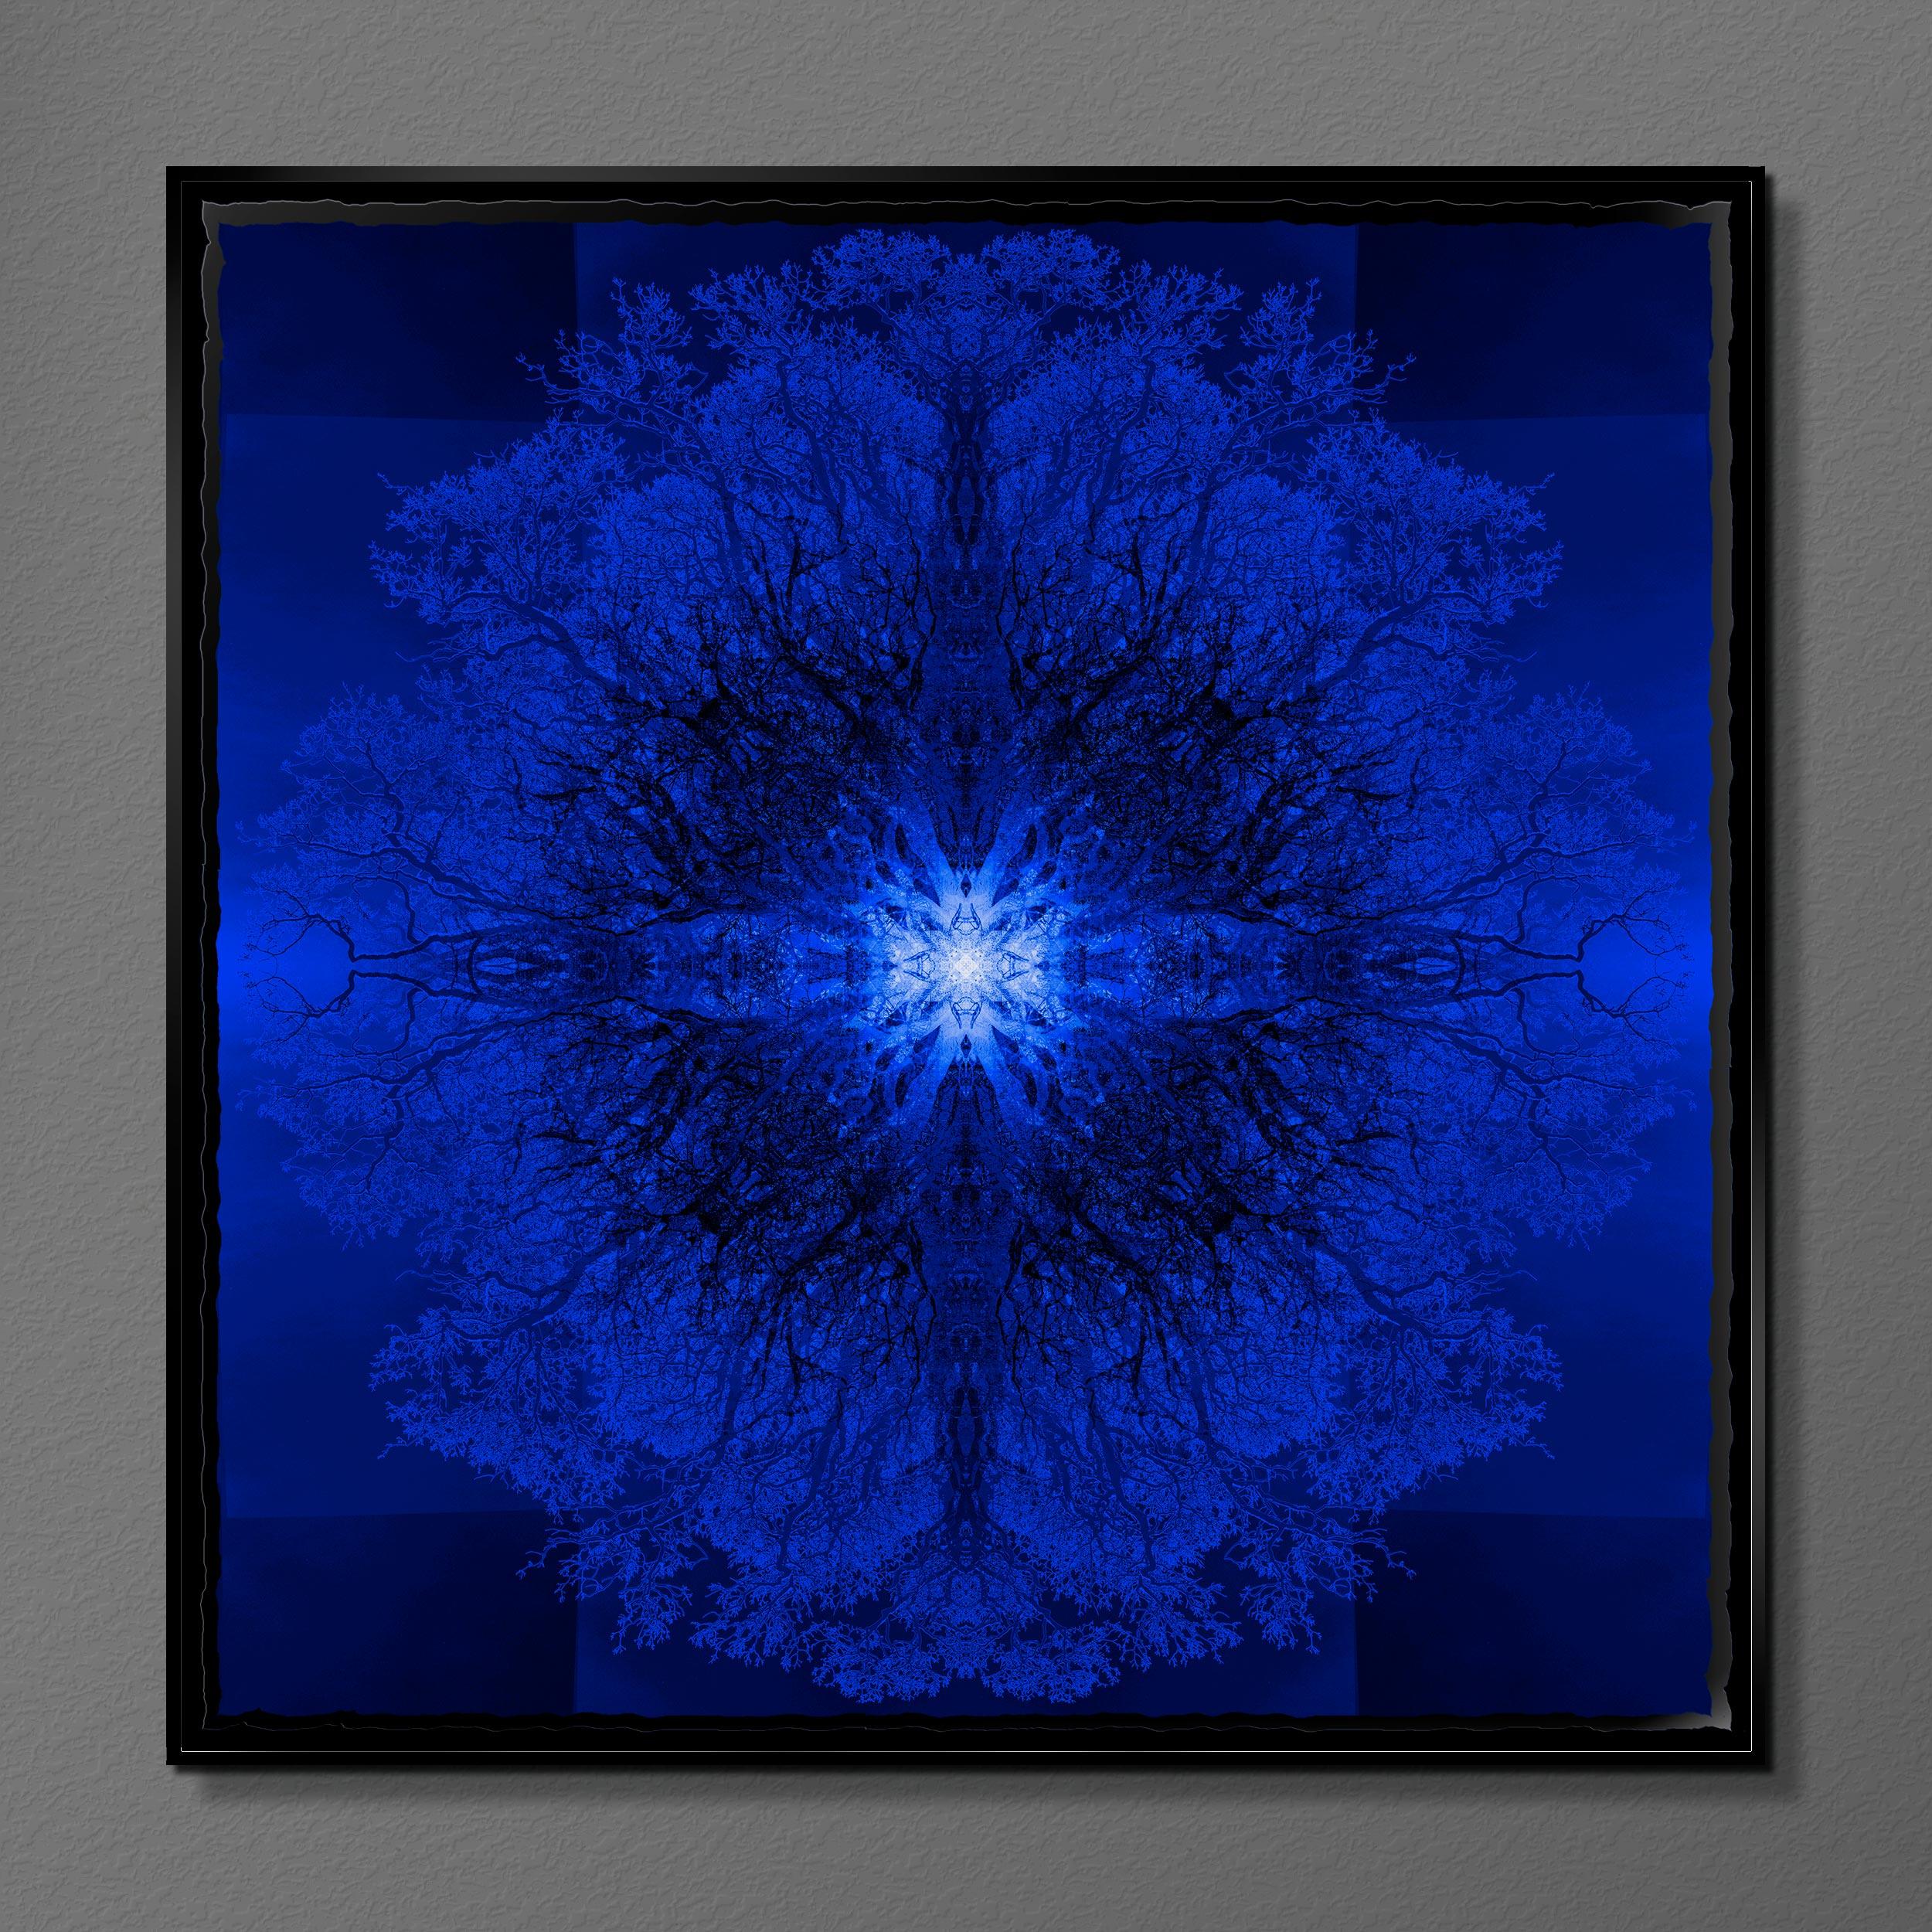 Symmetree - Tripomatic Klein<br/> Framed in Resin 75x75 cm